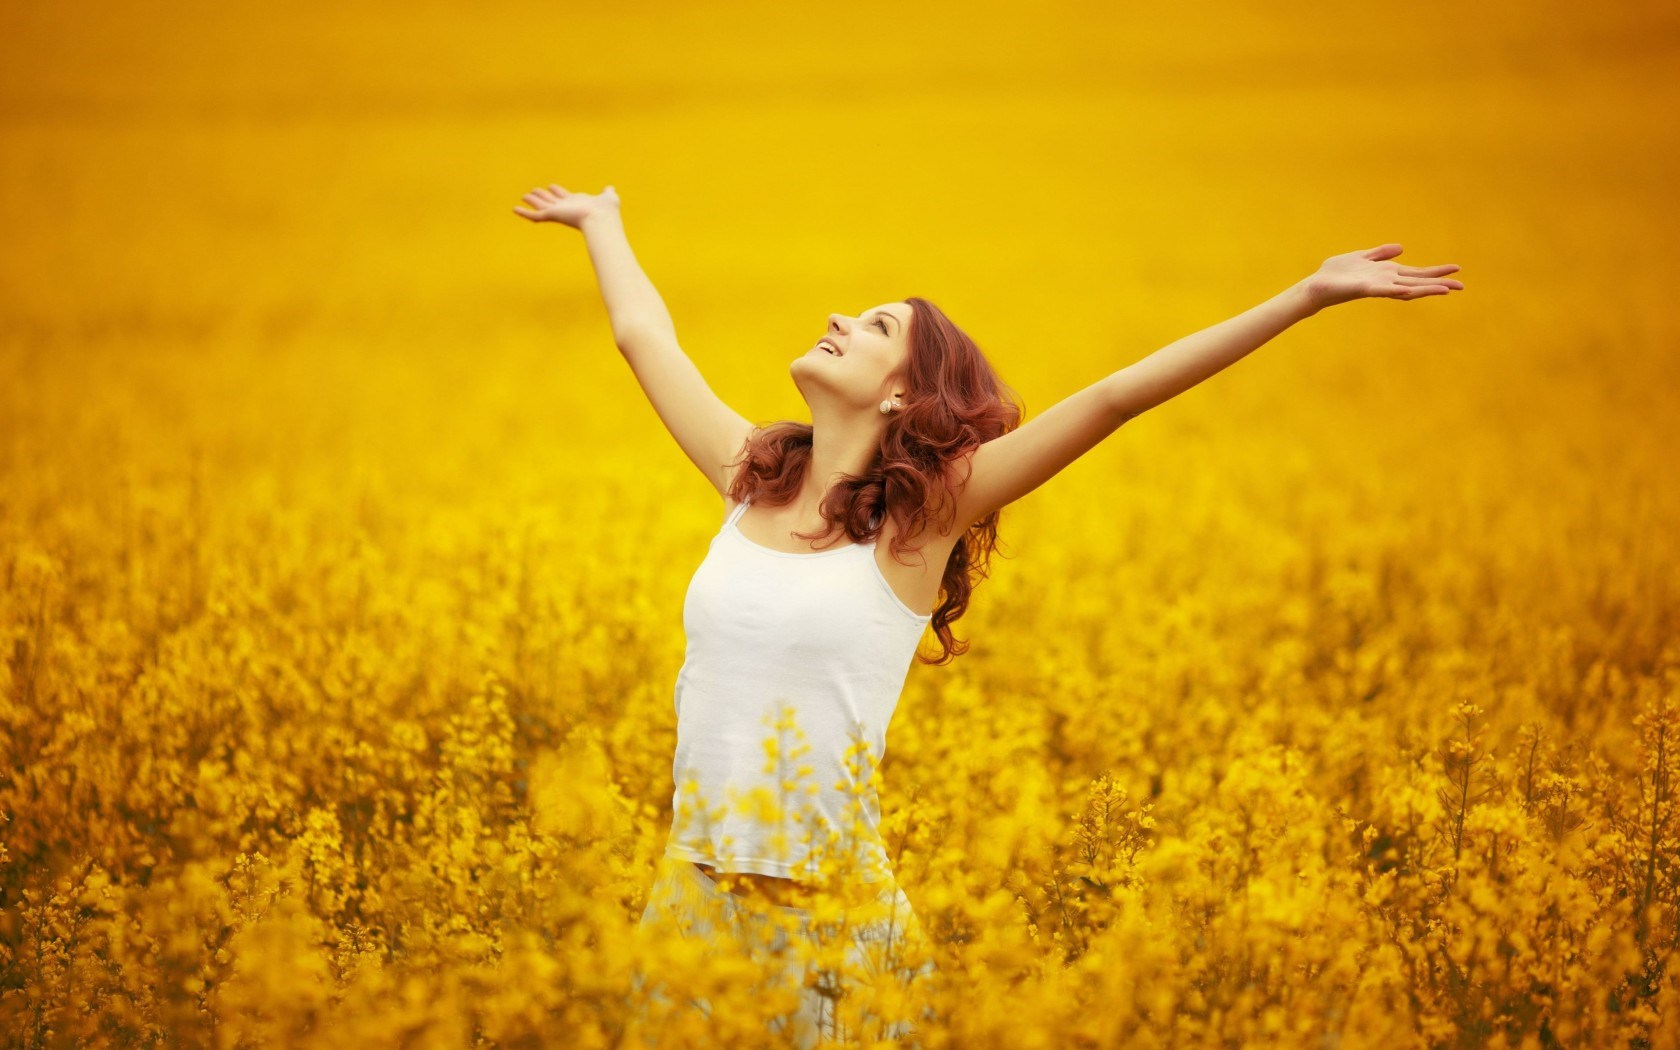 Wallpapers Celebrities Mood Girl Flowers Yellow Nature 1680x1050